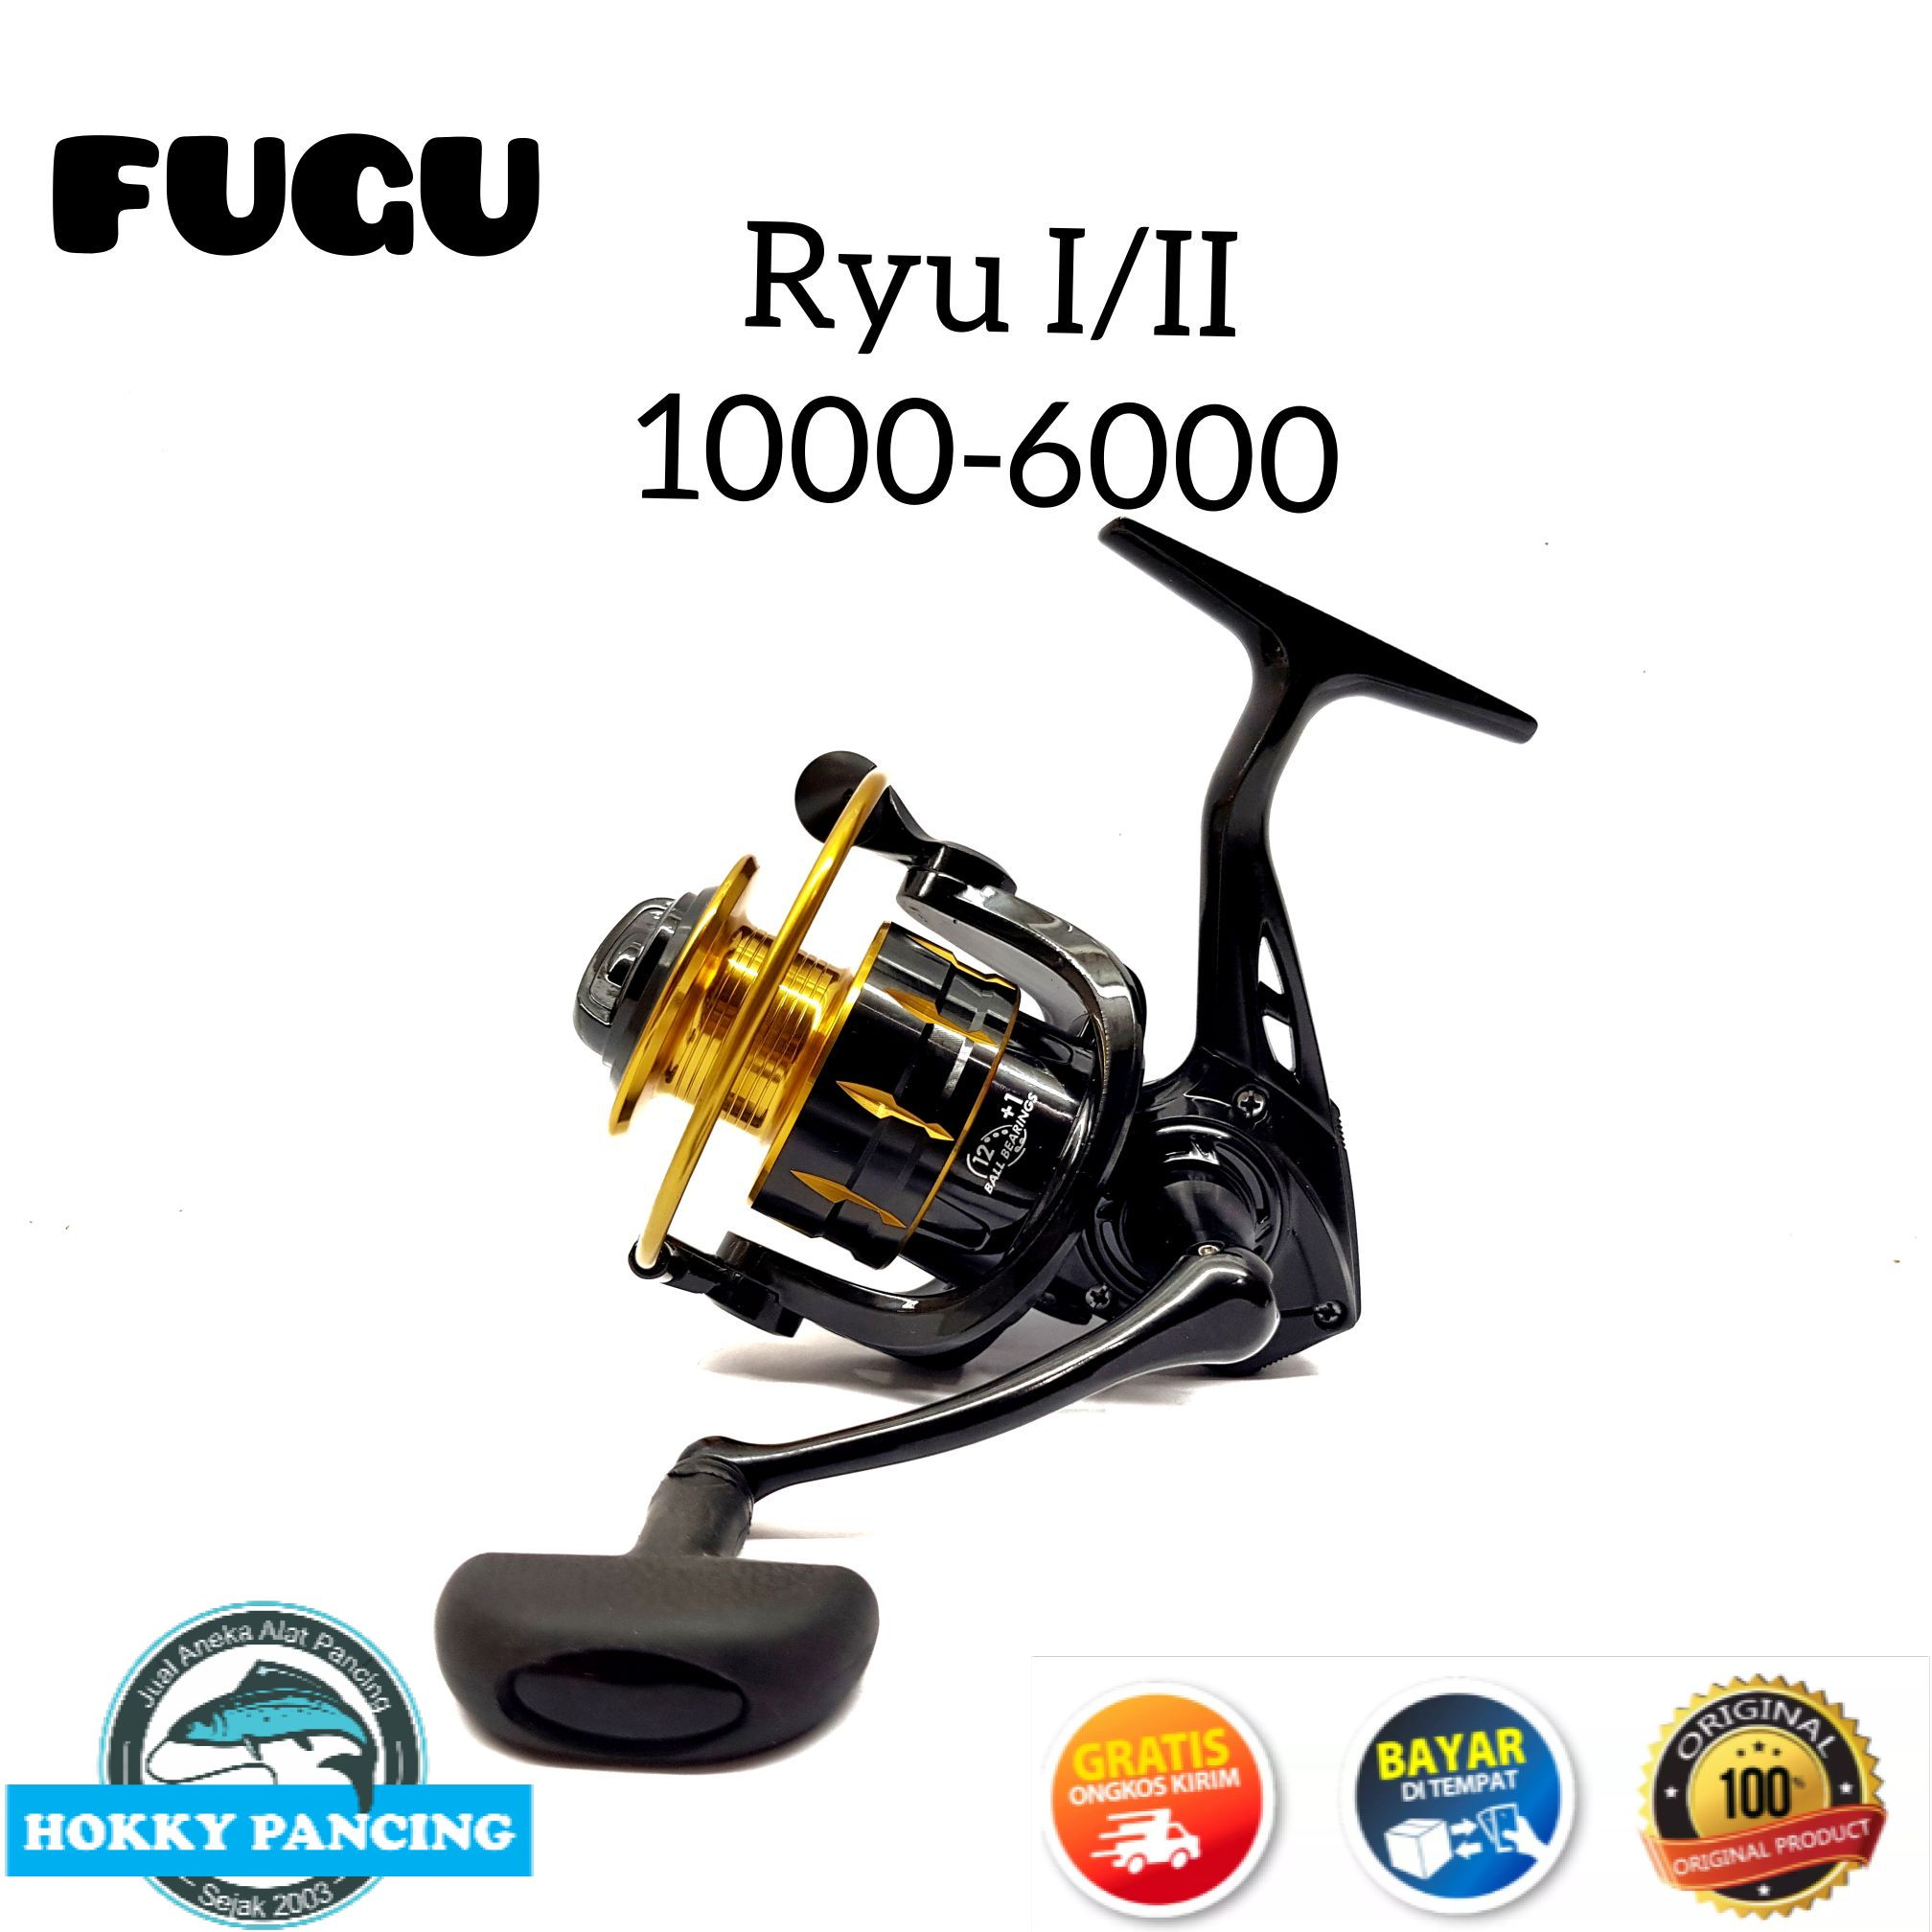 reel pancing fugu ryu 1000-6000 power handle